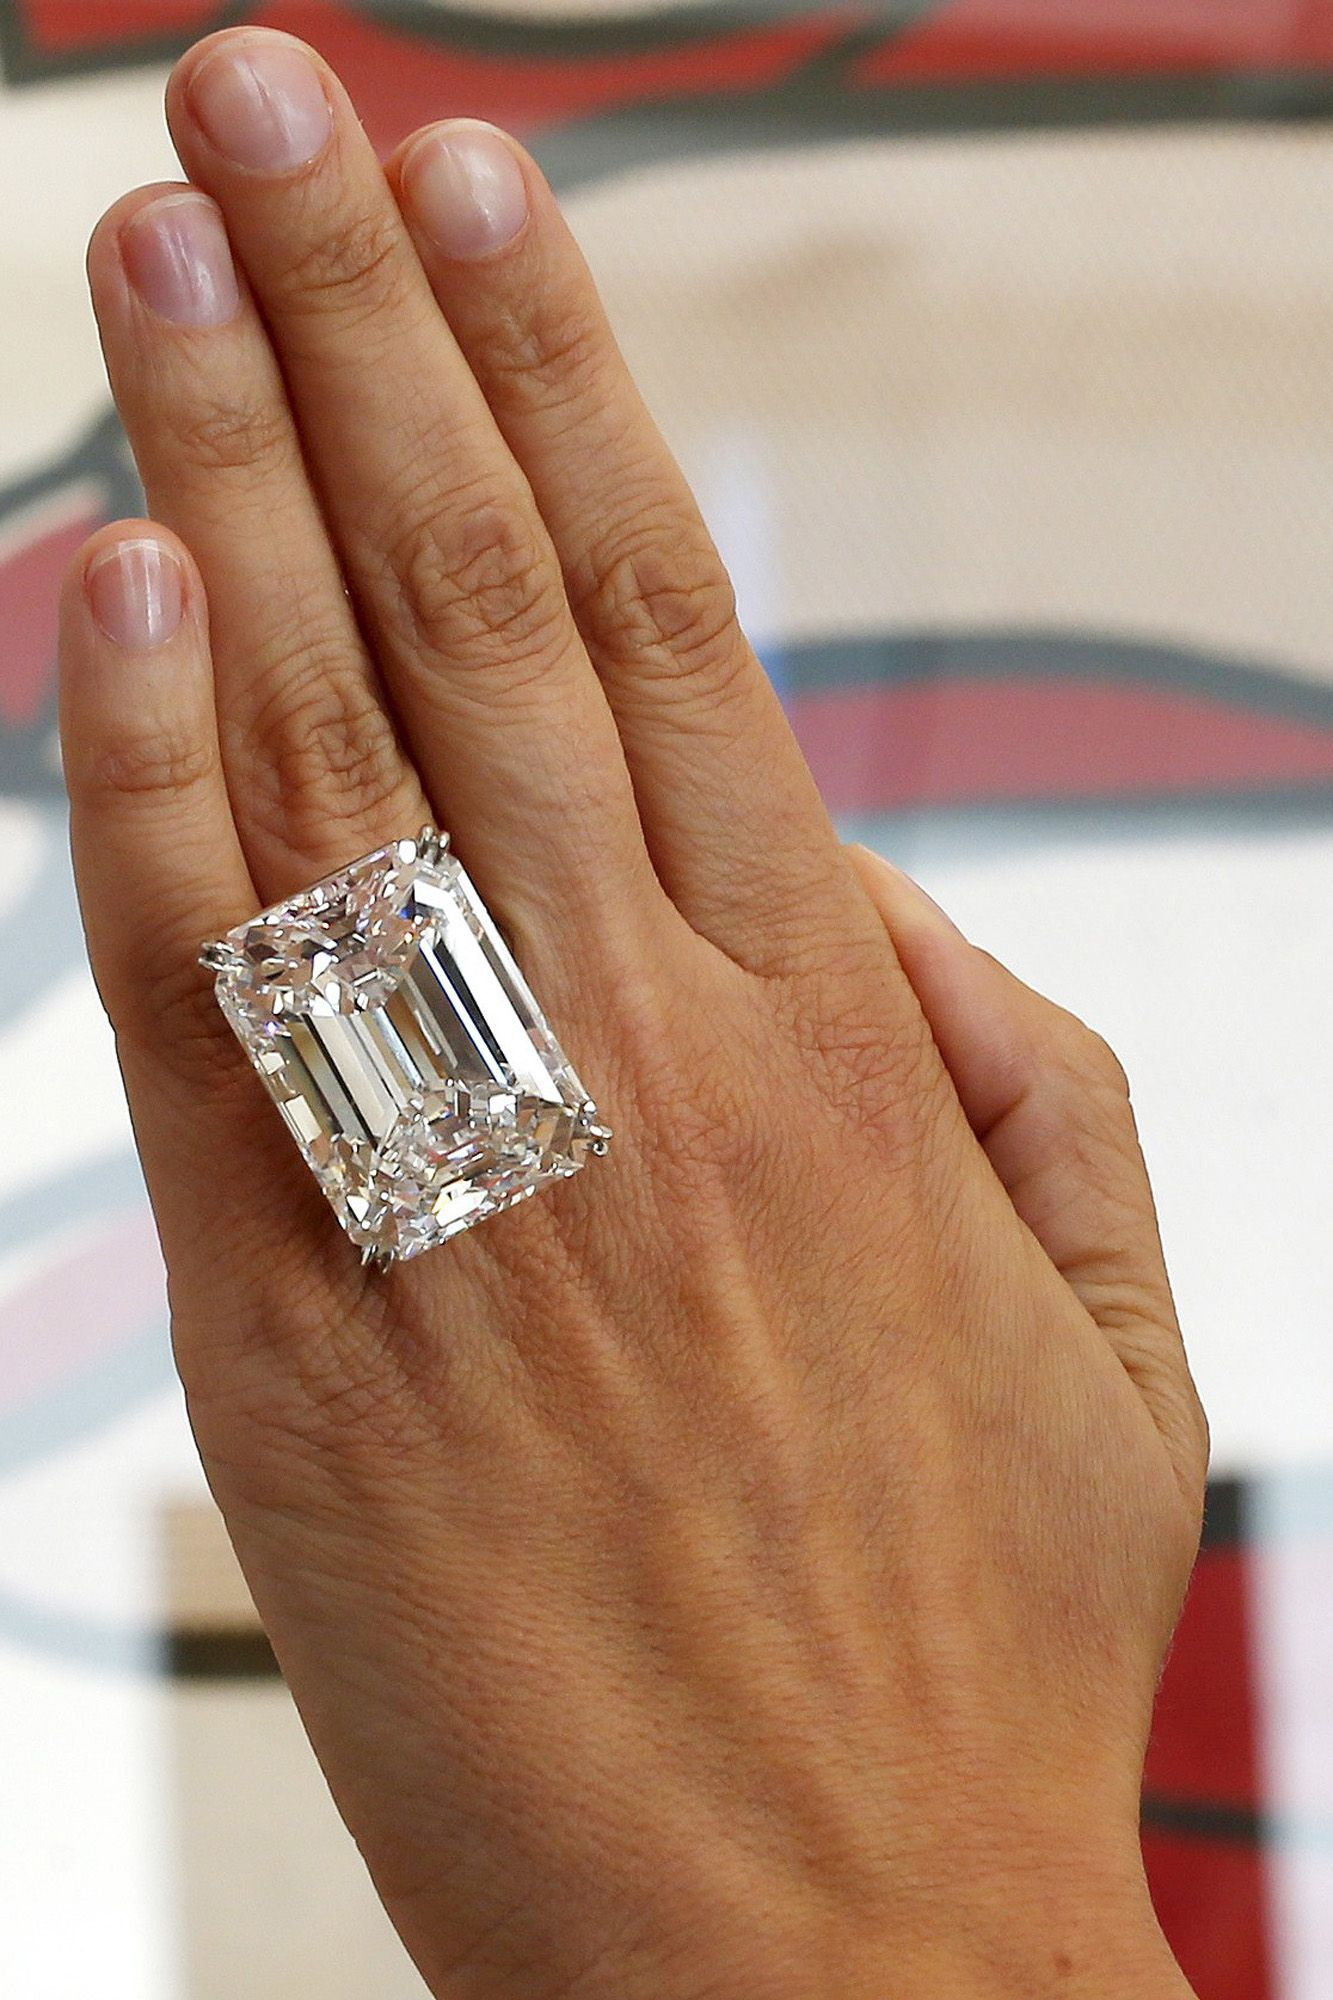 100 Carat Diamond Makes Auction History With 22m Sale Diamond Flawless Diamond Emerald Jewelry